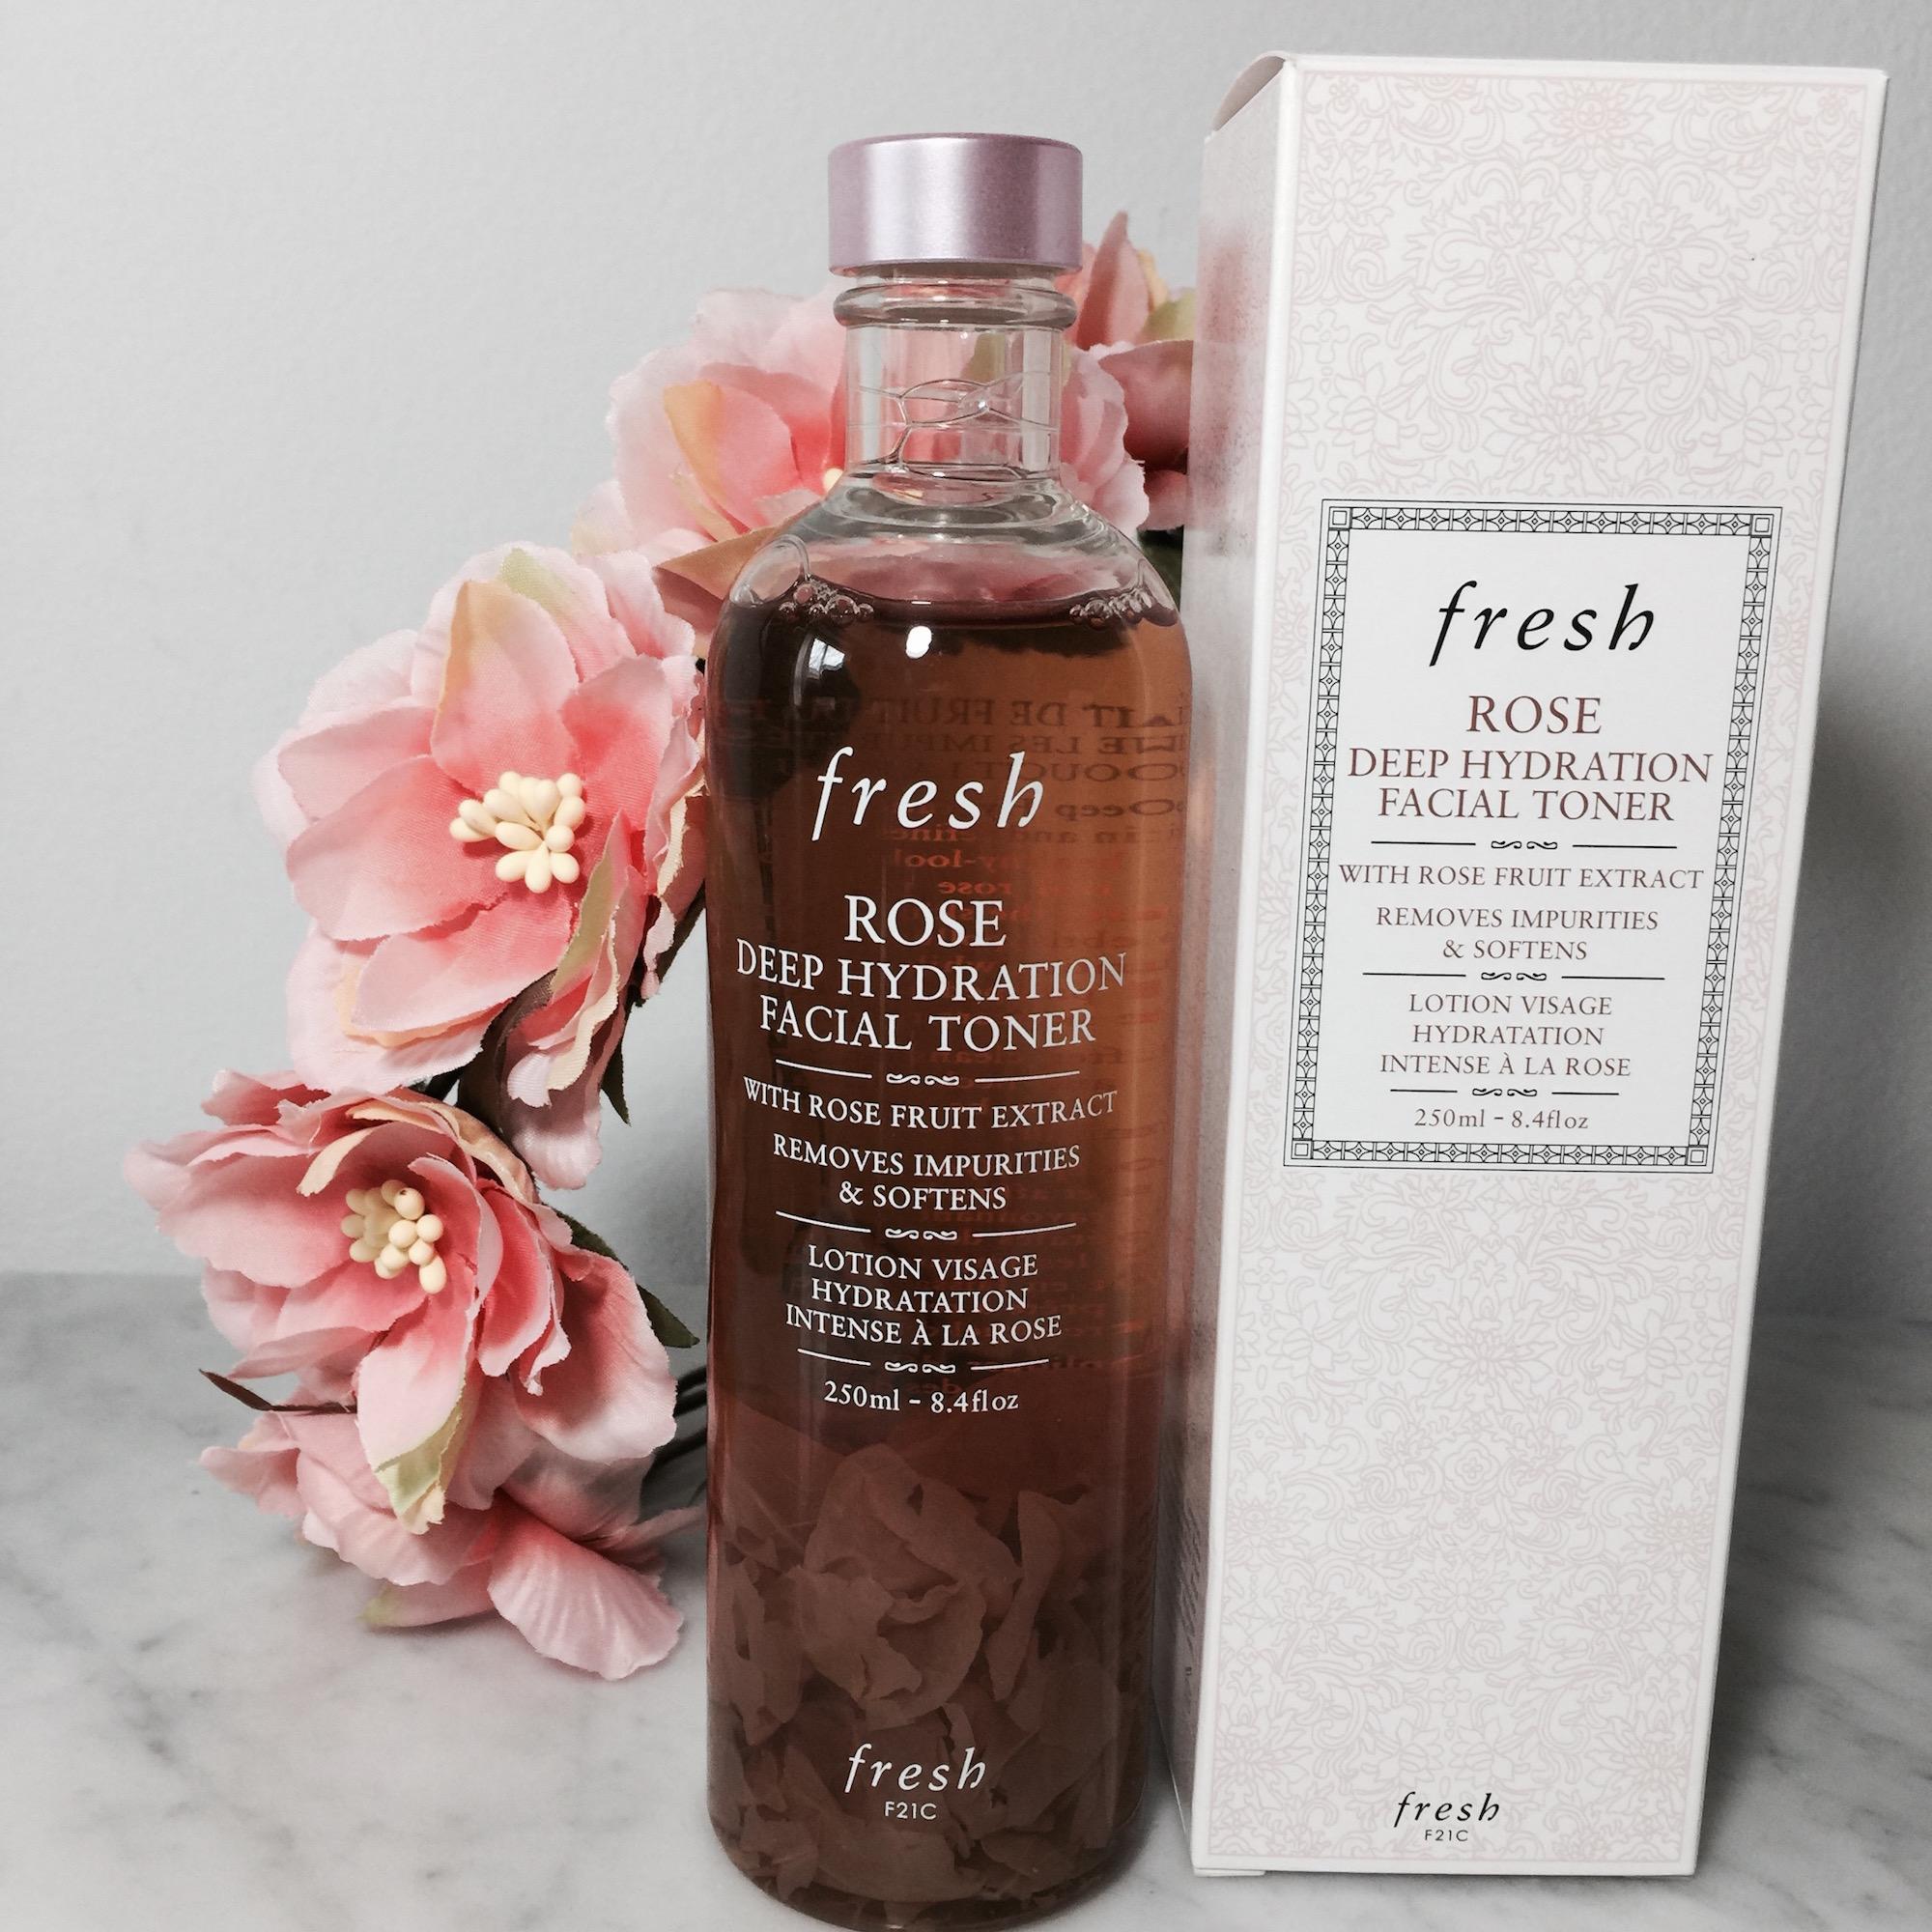 Fresh beauty haul from New York Broadway store -10.jpg